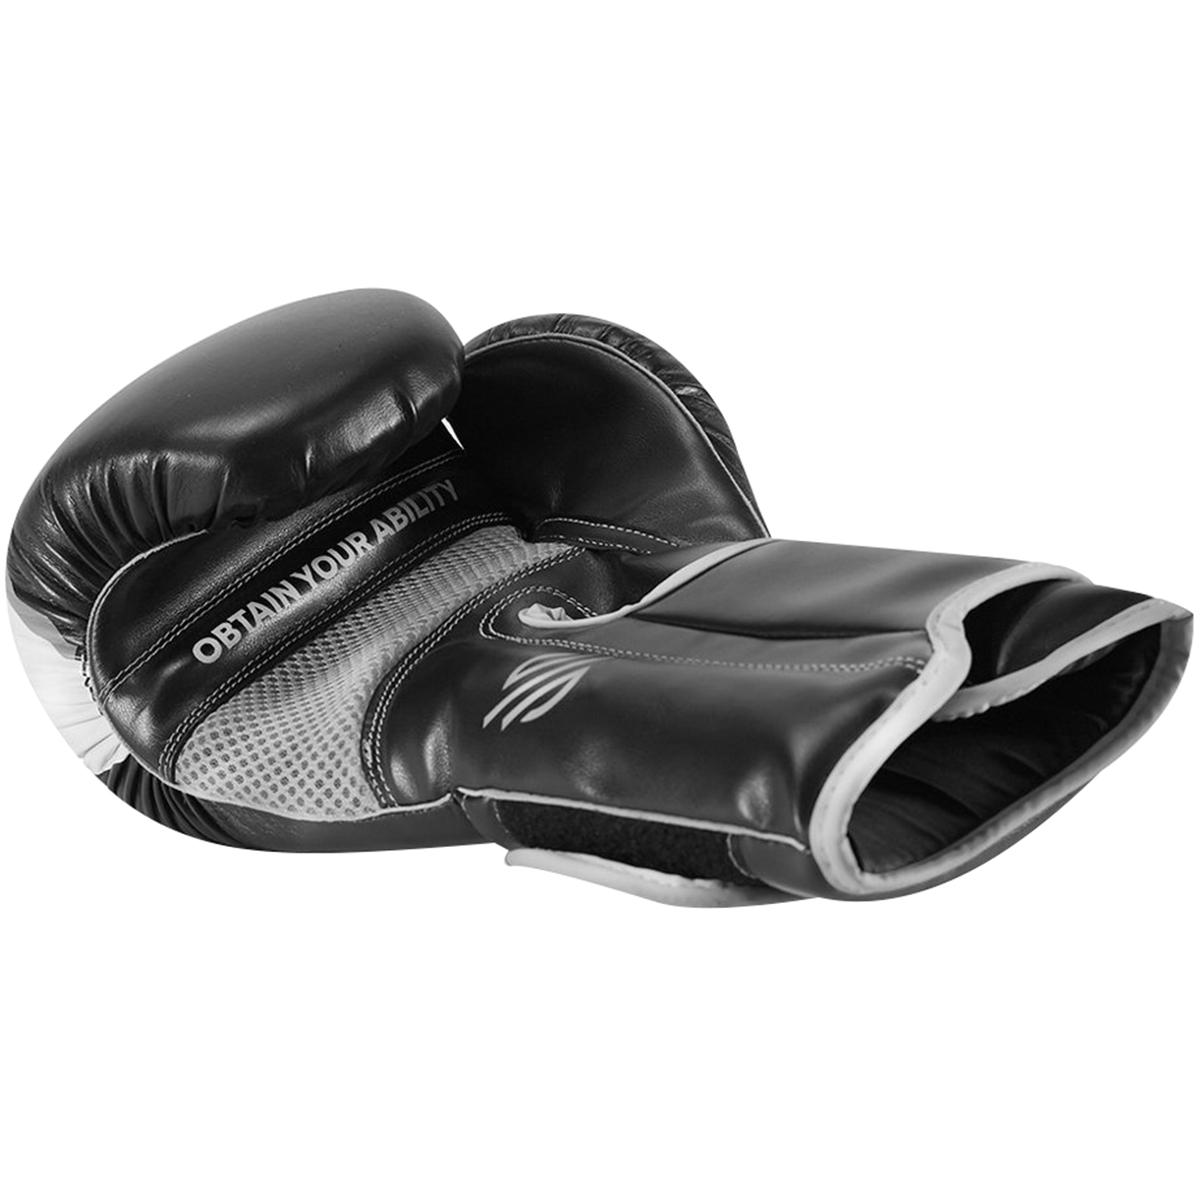 thumbnail 13 - Sanabul Essential Gel Training Boxing Gloves